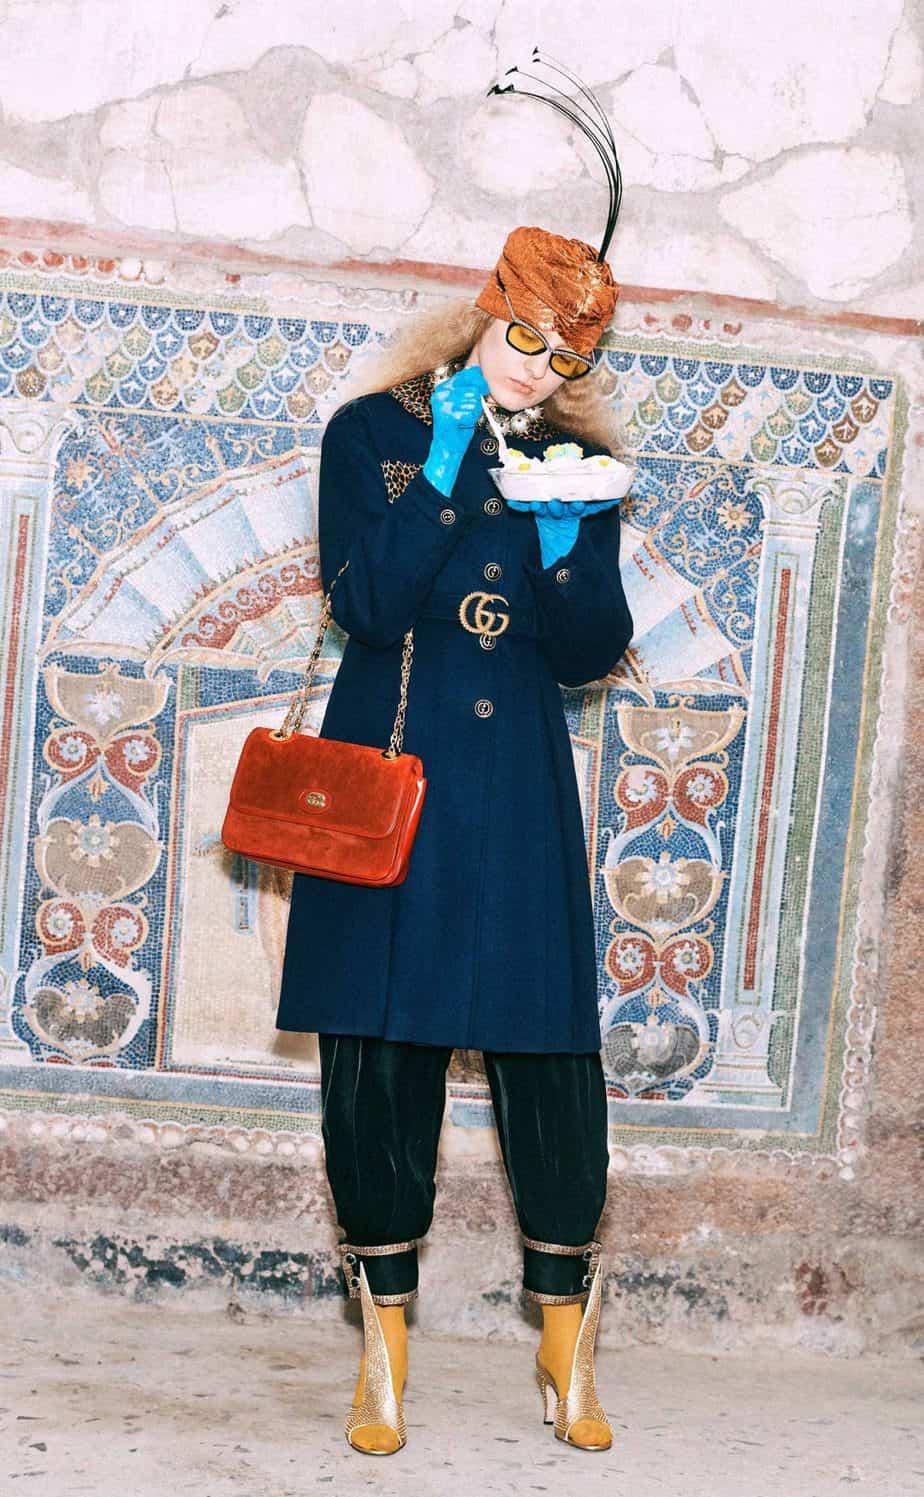 GUCCI, FALL 2019. WOMEN'S FASHION, Photographer Harmony Korine, Art Director, Christopher Simmonds - 99